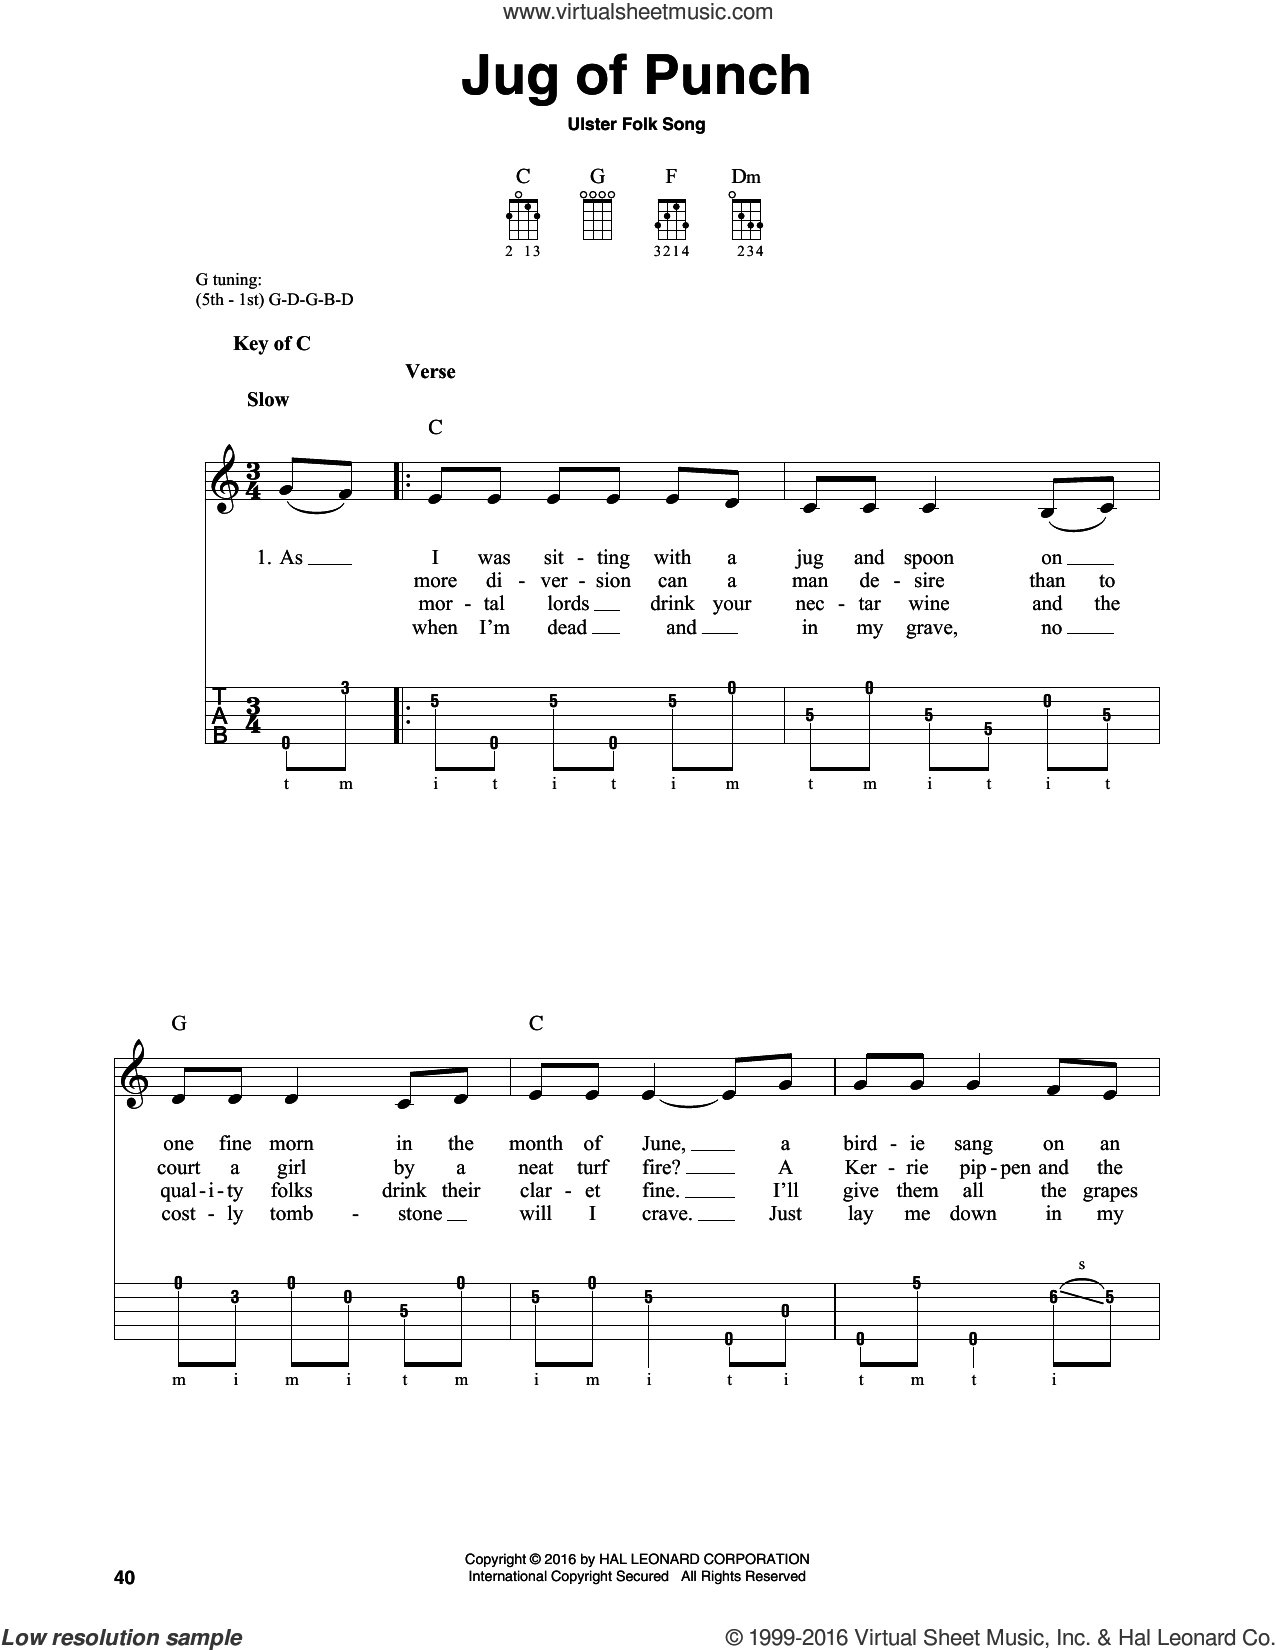 Jug Of Punch sheet music for banjo solo, intermediate skill level